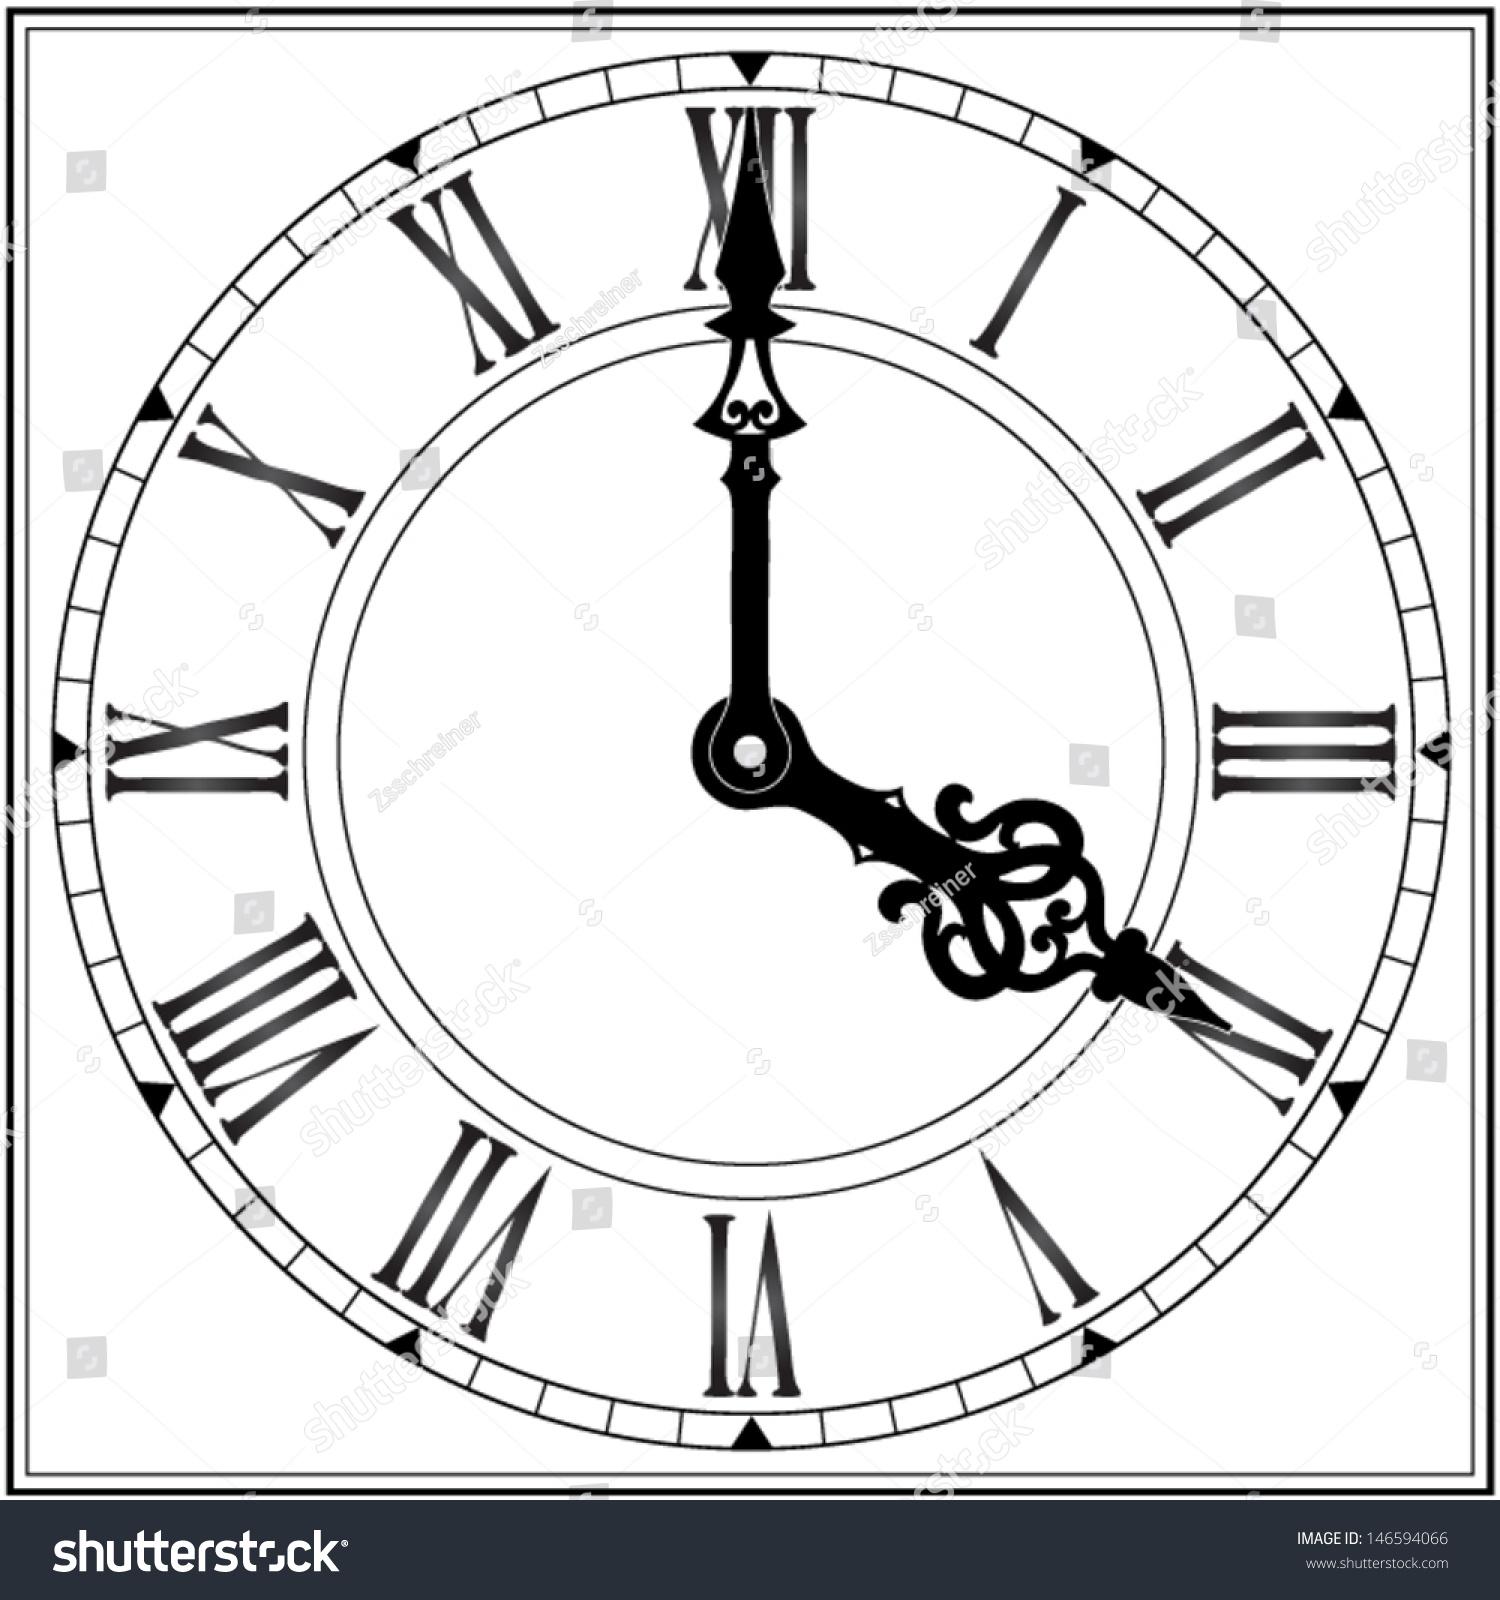 Worksheet Roman Numersl elegant roman numeral clock vector illustration stock illustration